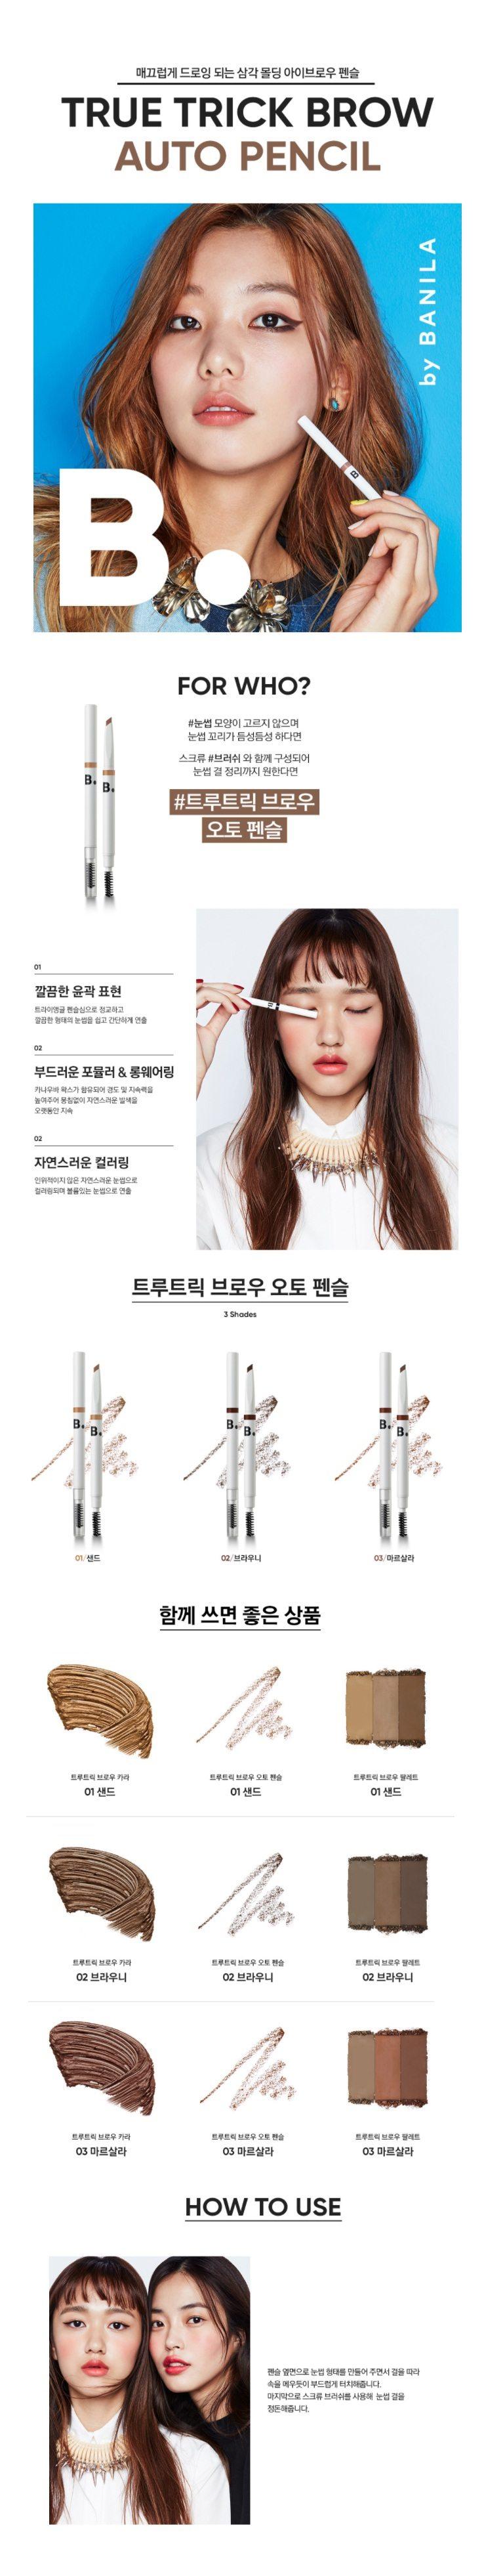 Banila Co True Trick Brow Auto Pencil korean cosmetic makeup product online shop malaysia singapore macau1